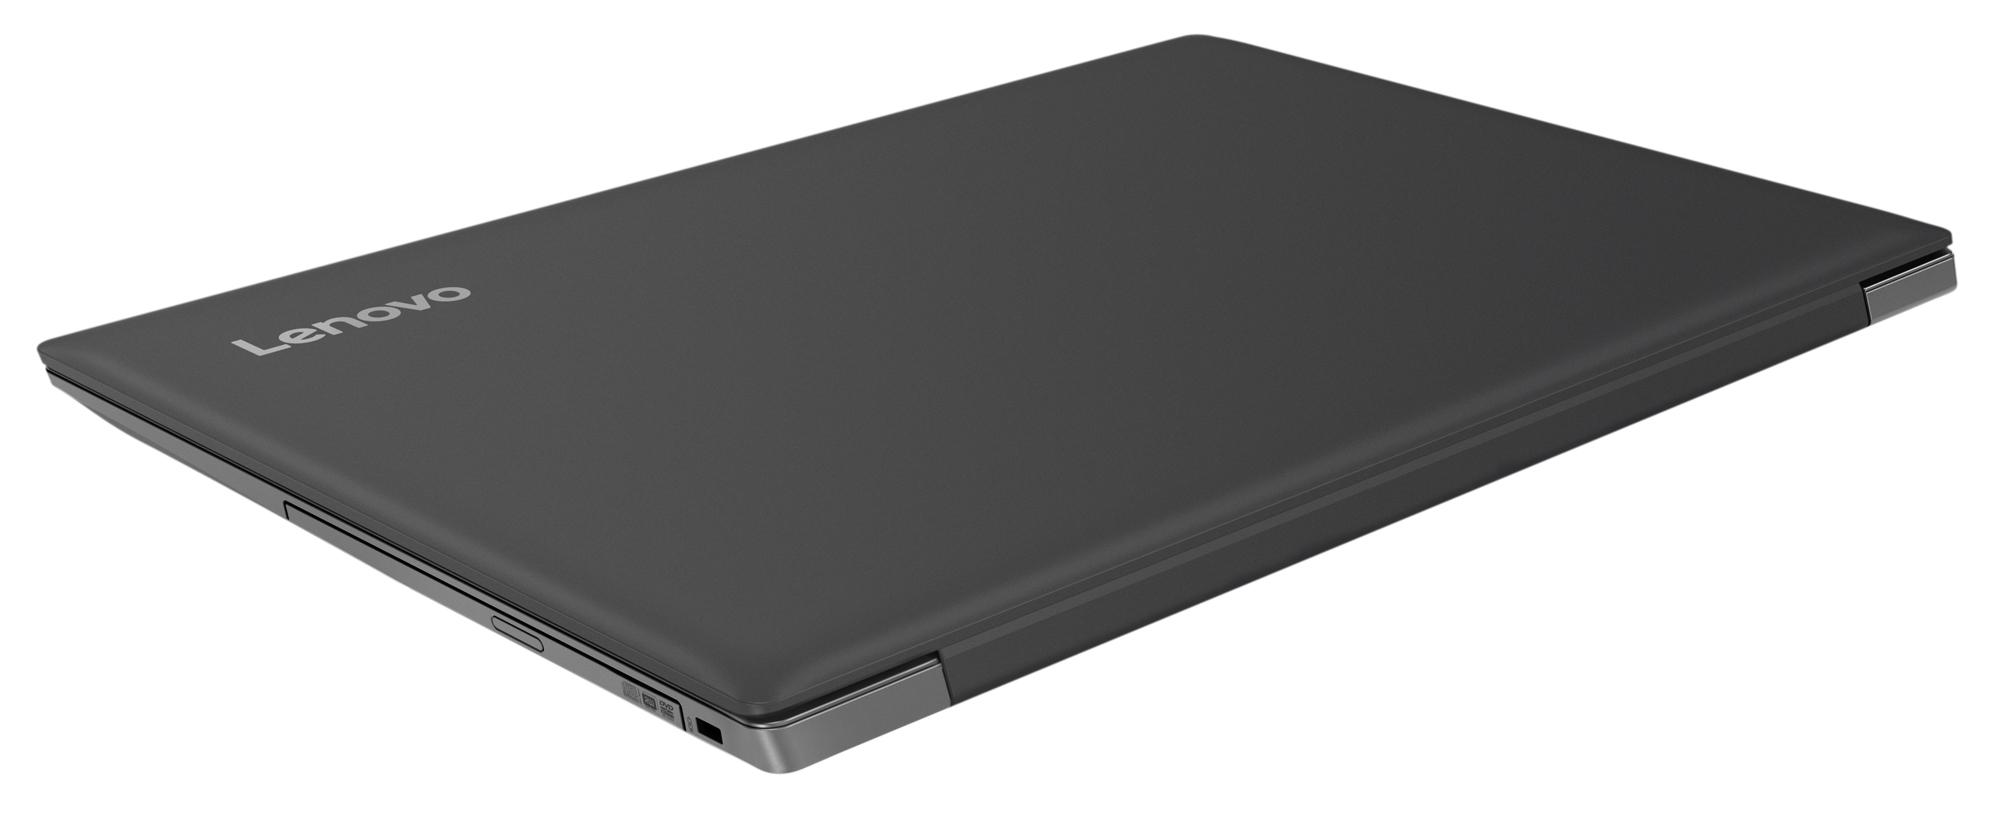 Фото  Ноутбук Lenovo ideapad 330-15 Onyx Black (81DE01FPRA)